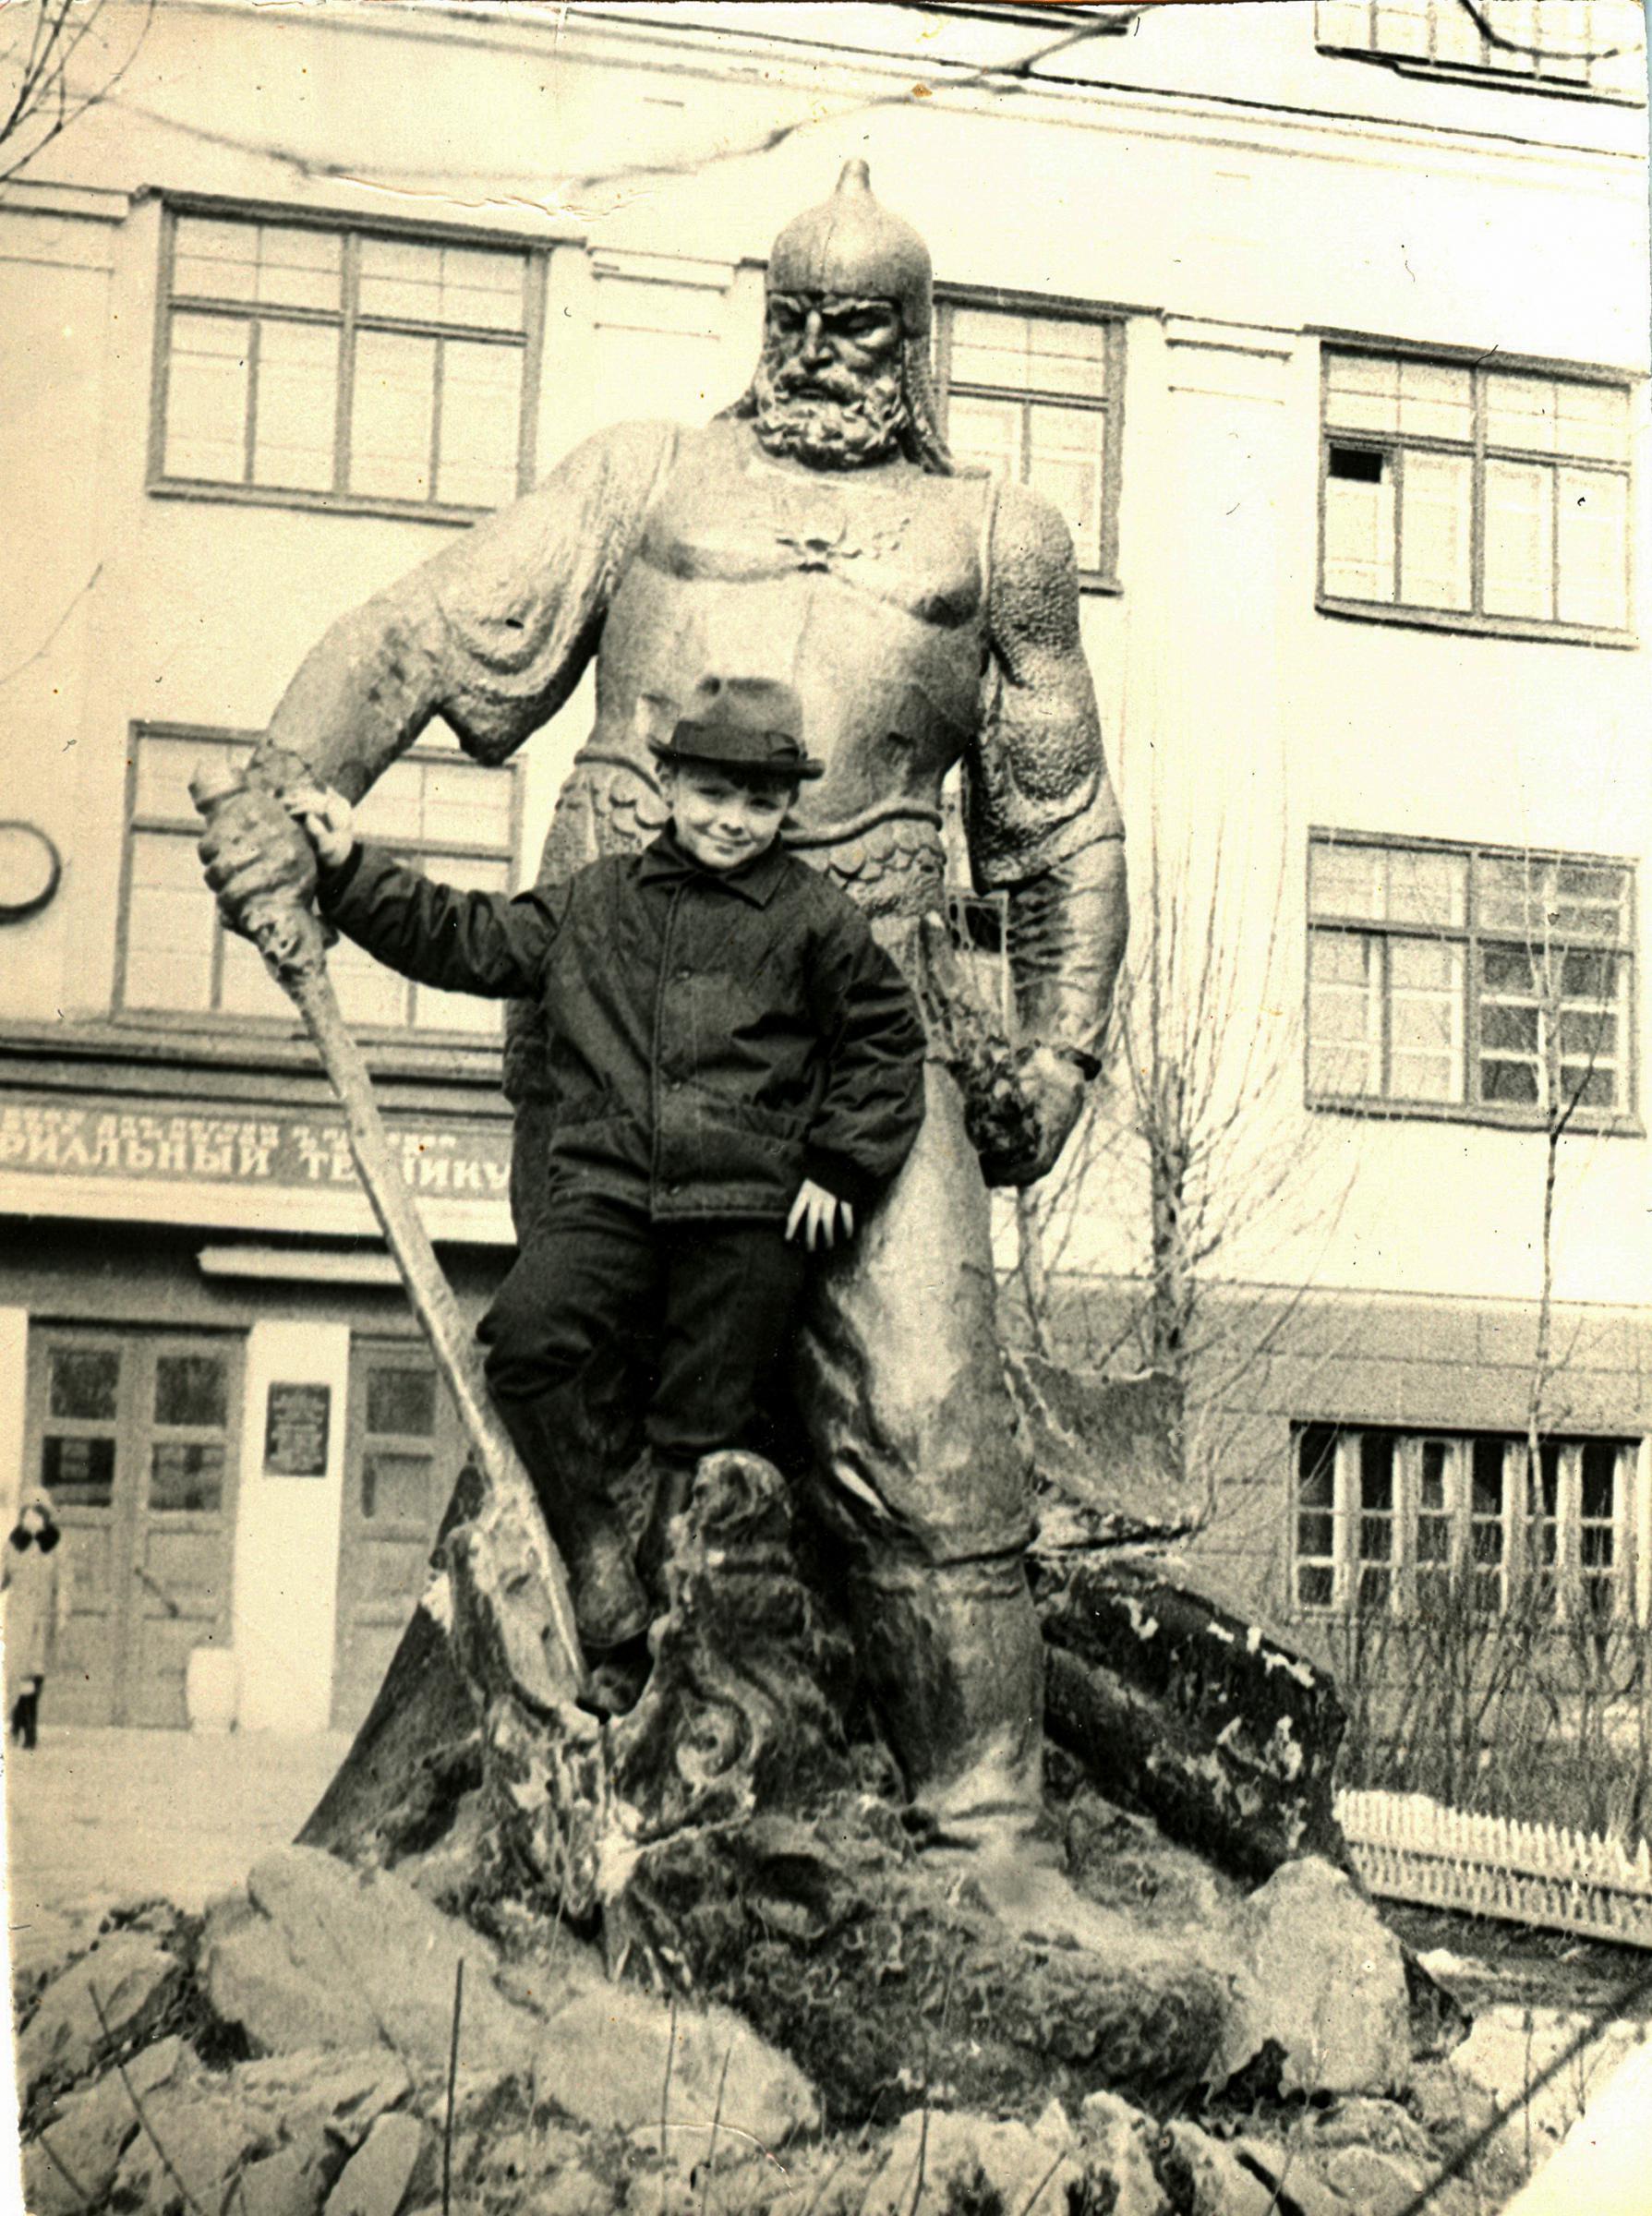 """Витязь"" у индустриального техникума, 1972 год"